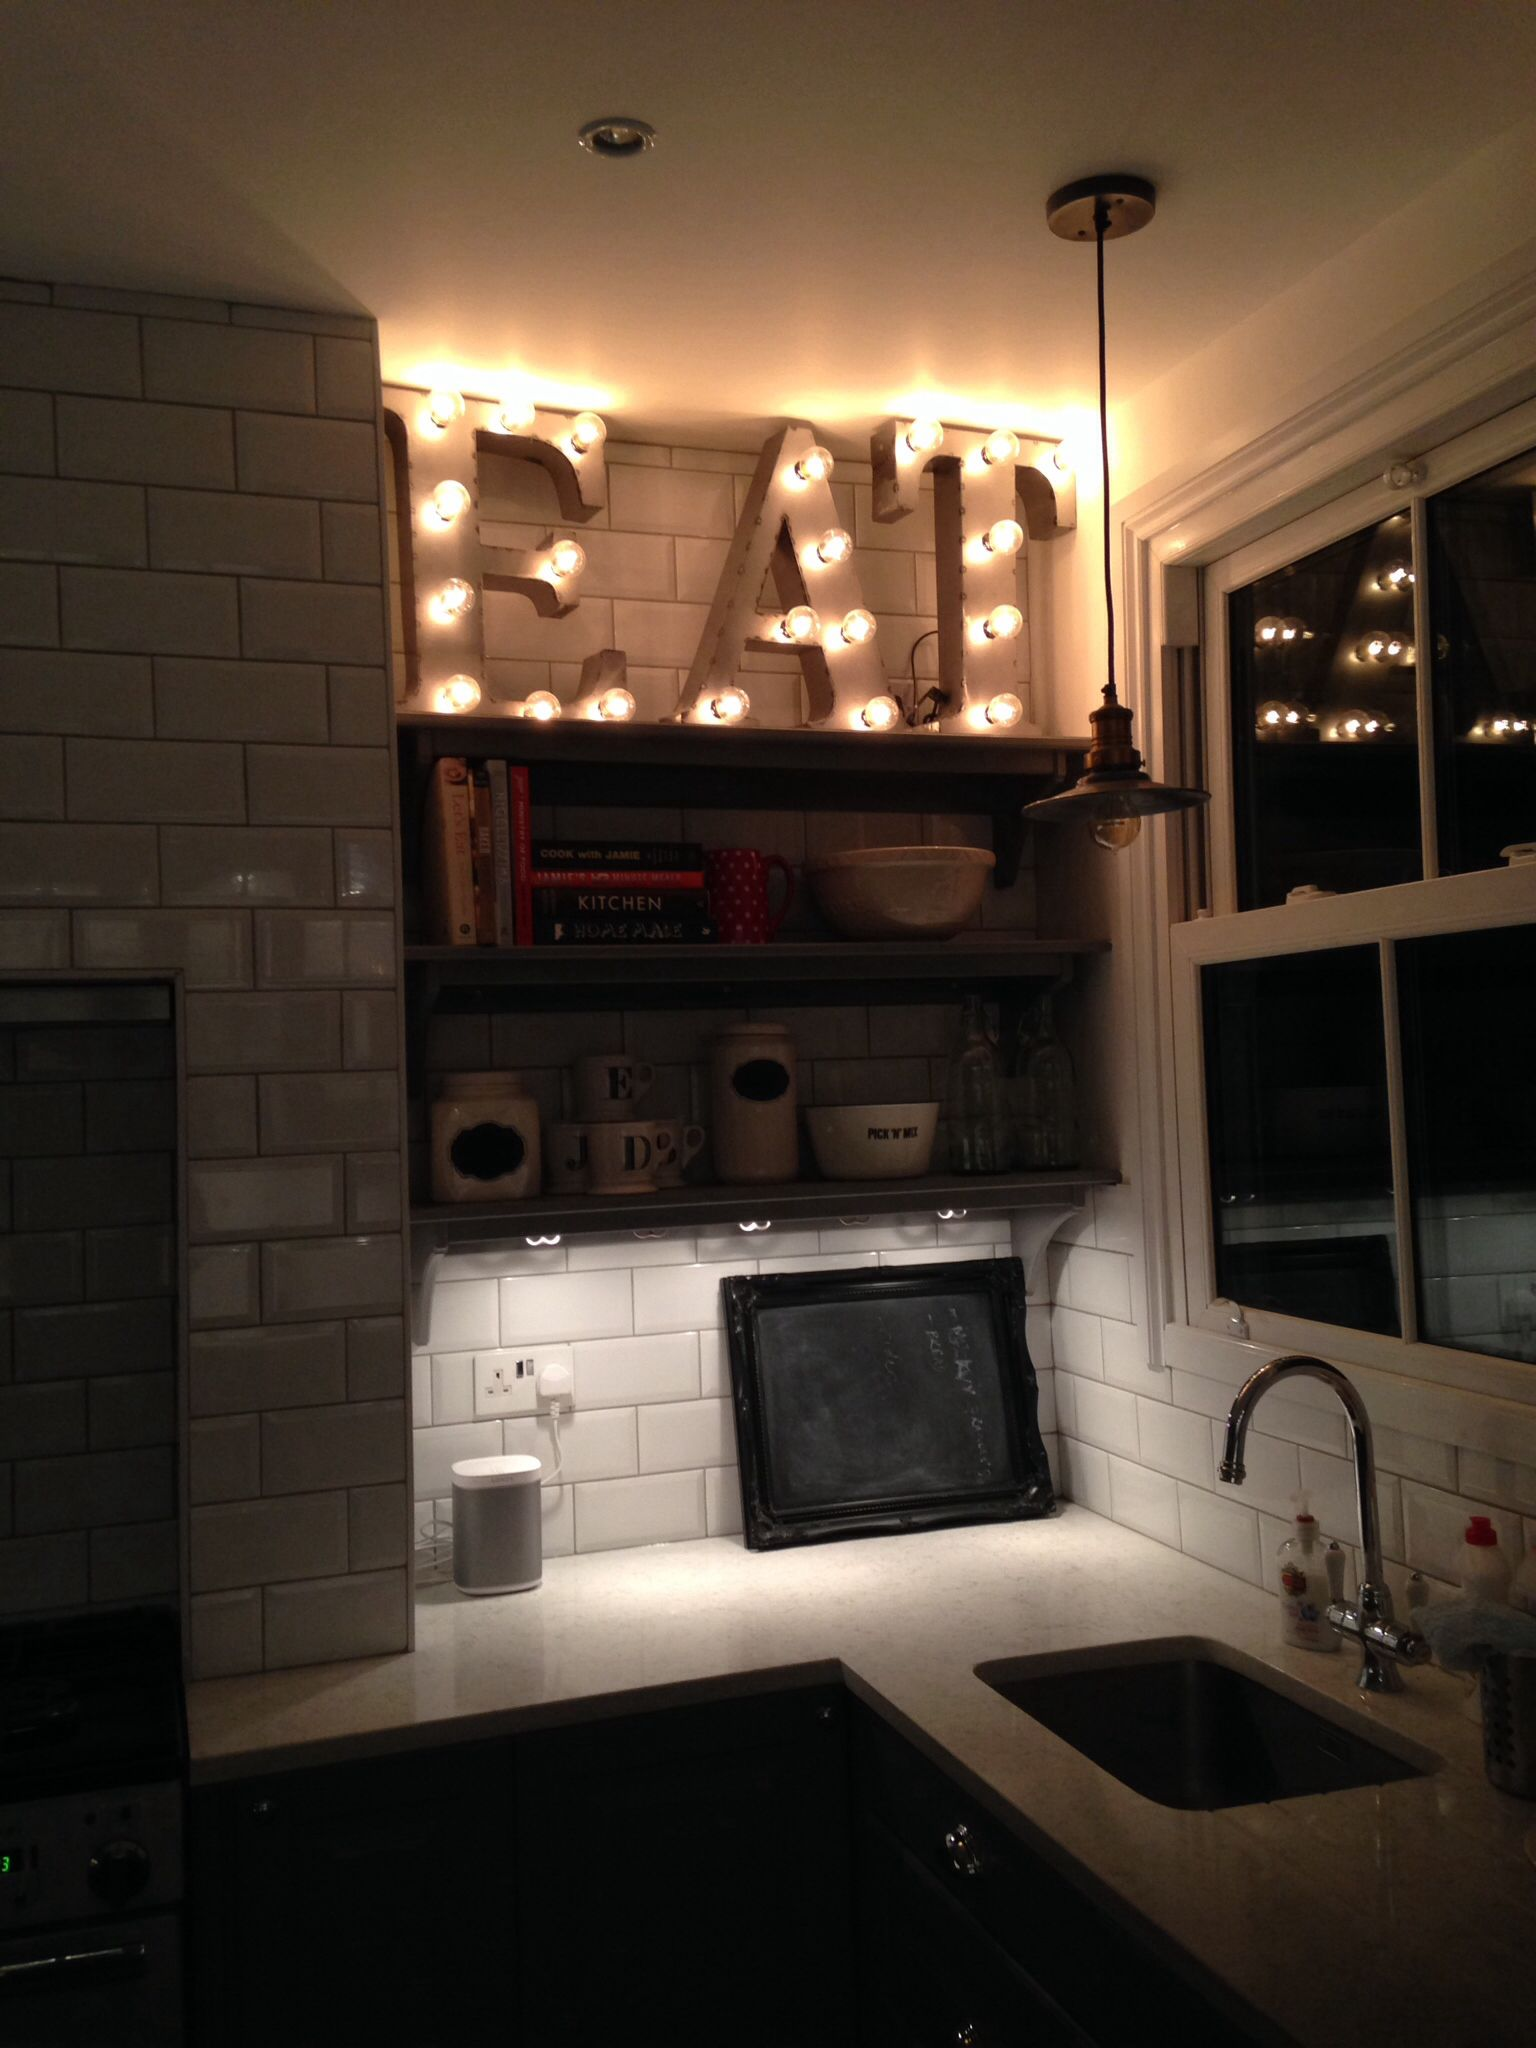 Light Bulb EAT Sign Kitchen